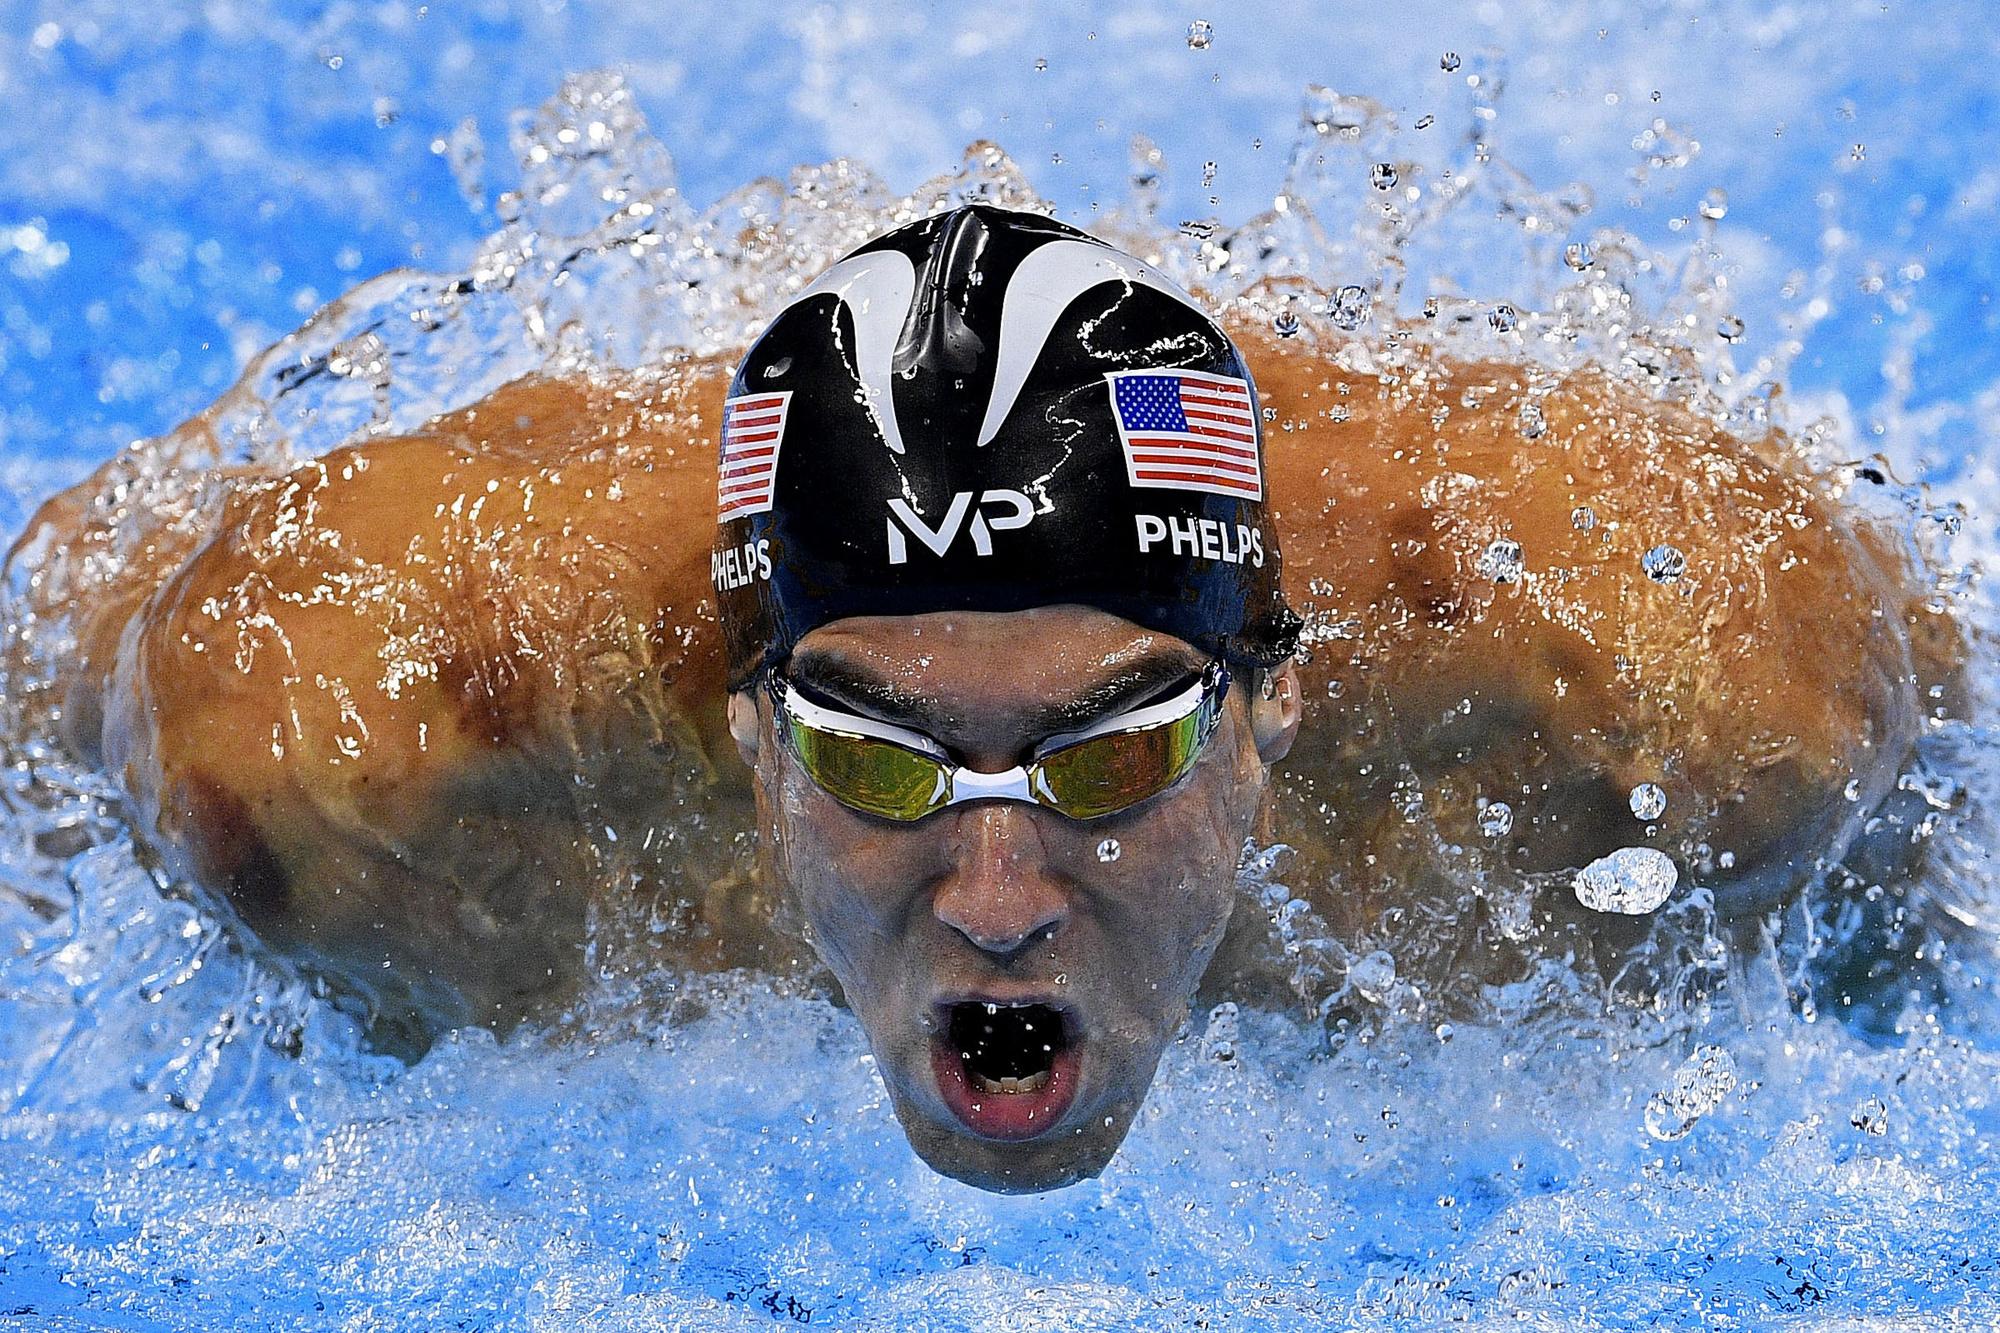 Michael Phelps, Belga Image